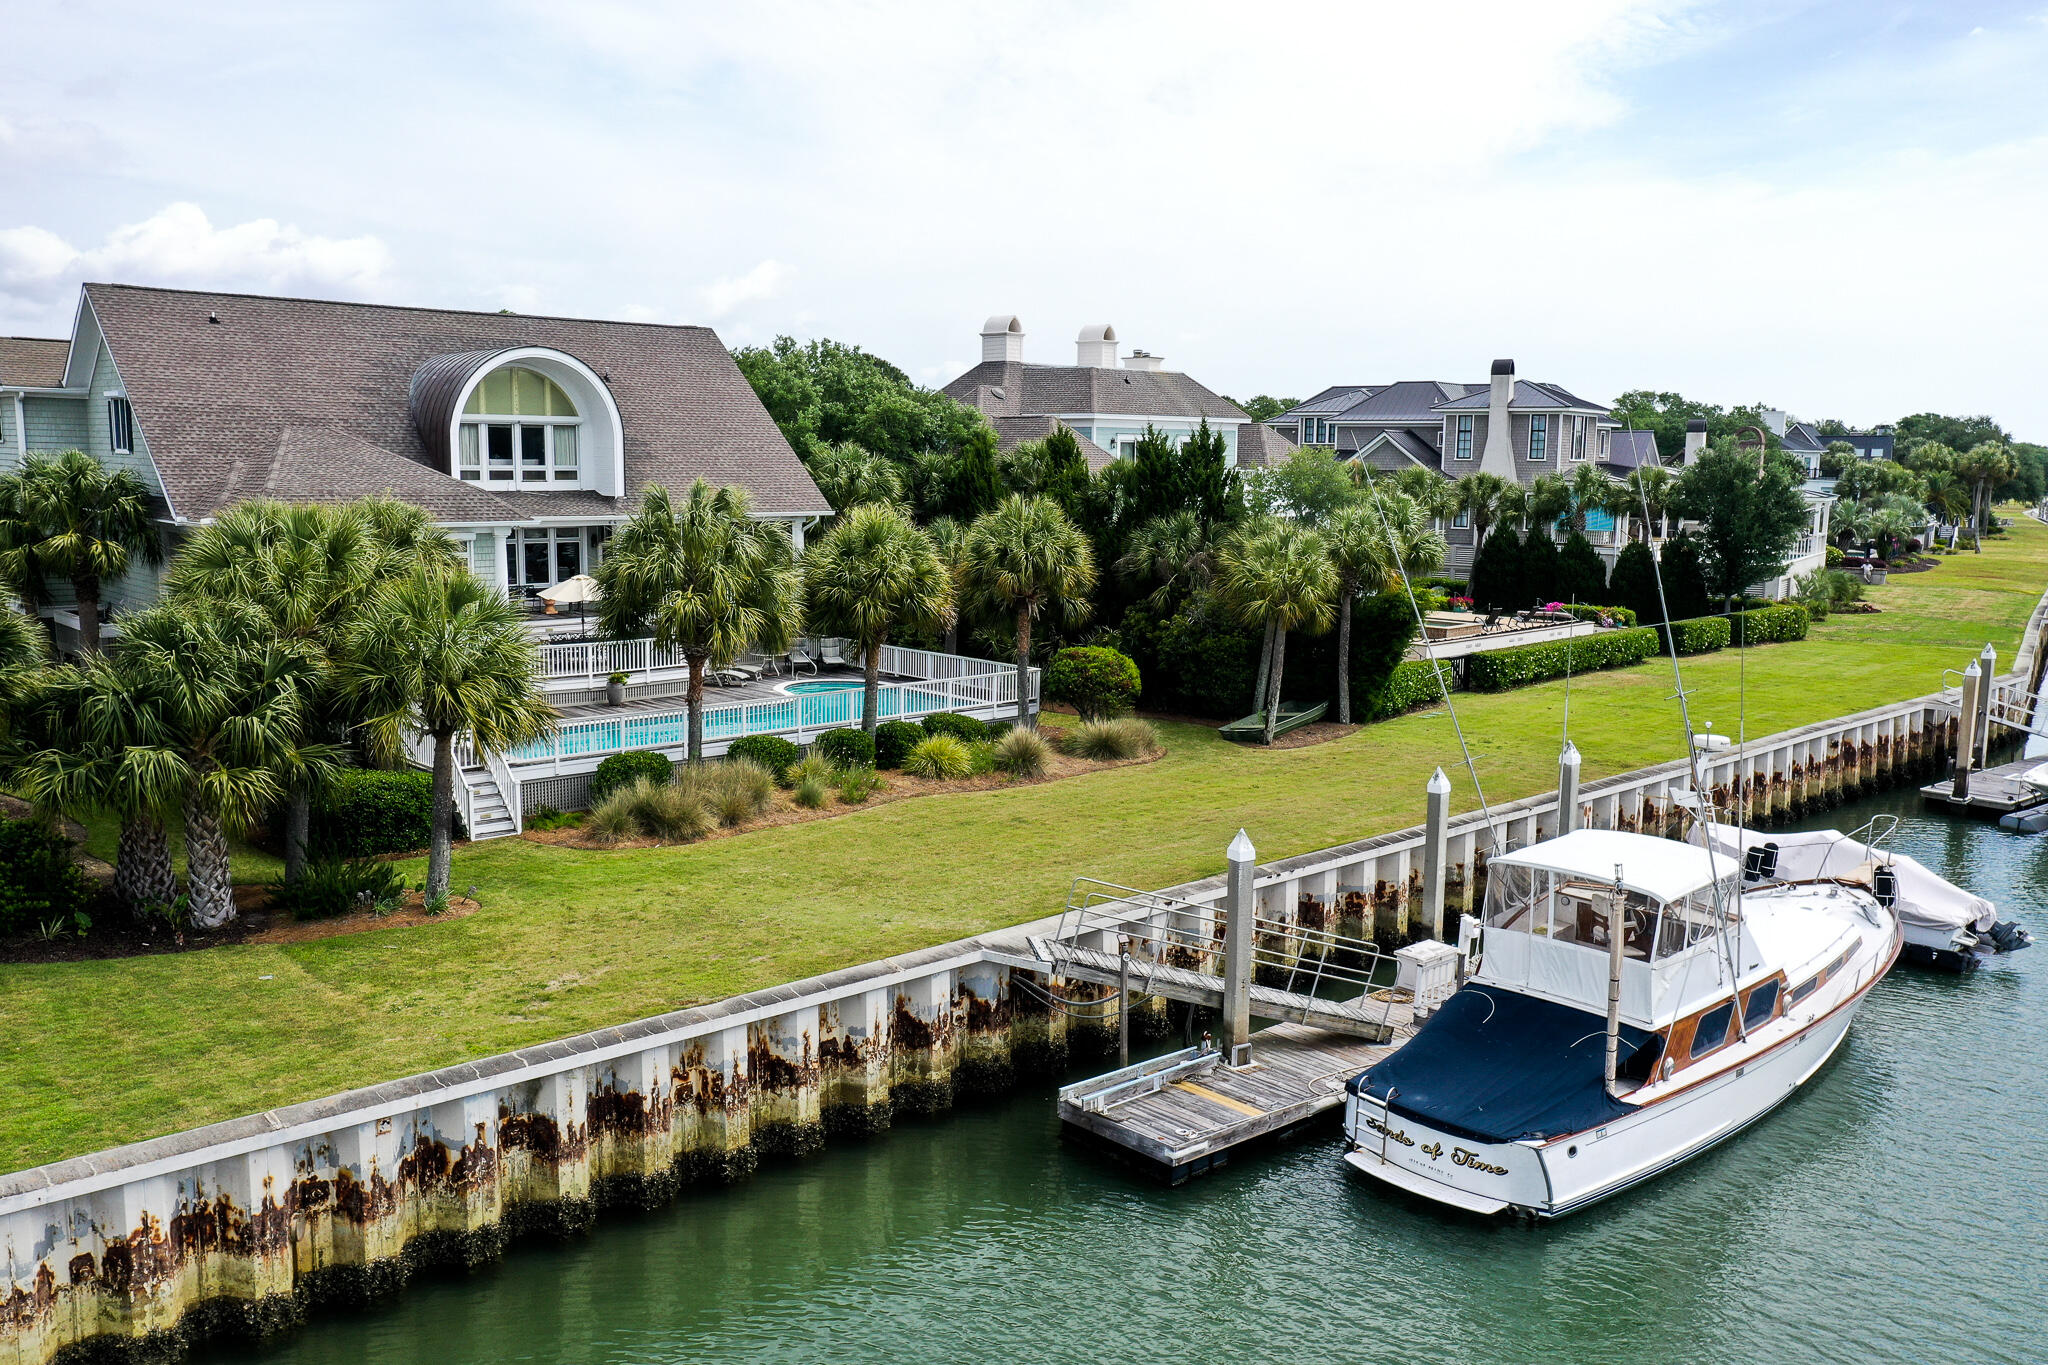 42 Waterway Island Drive Drive Isle of Palms $4,250,000.00